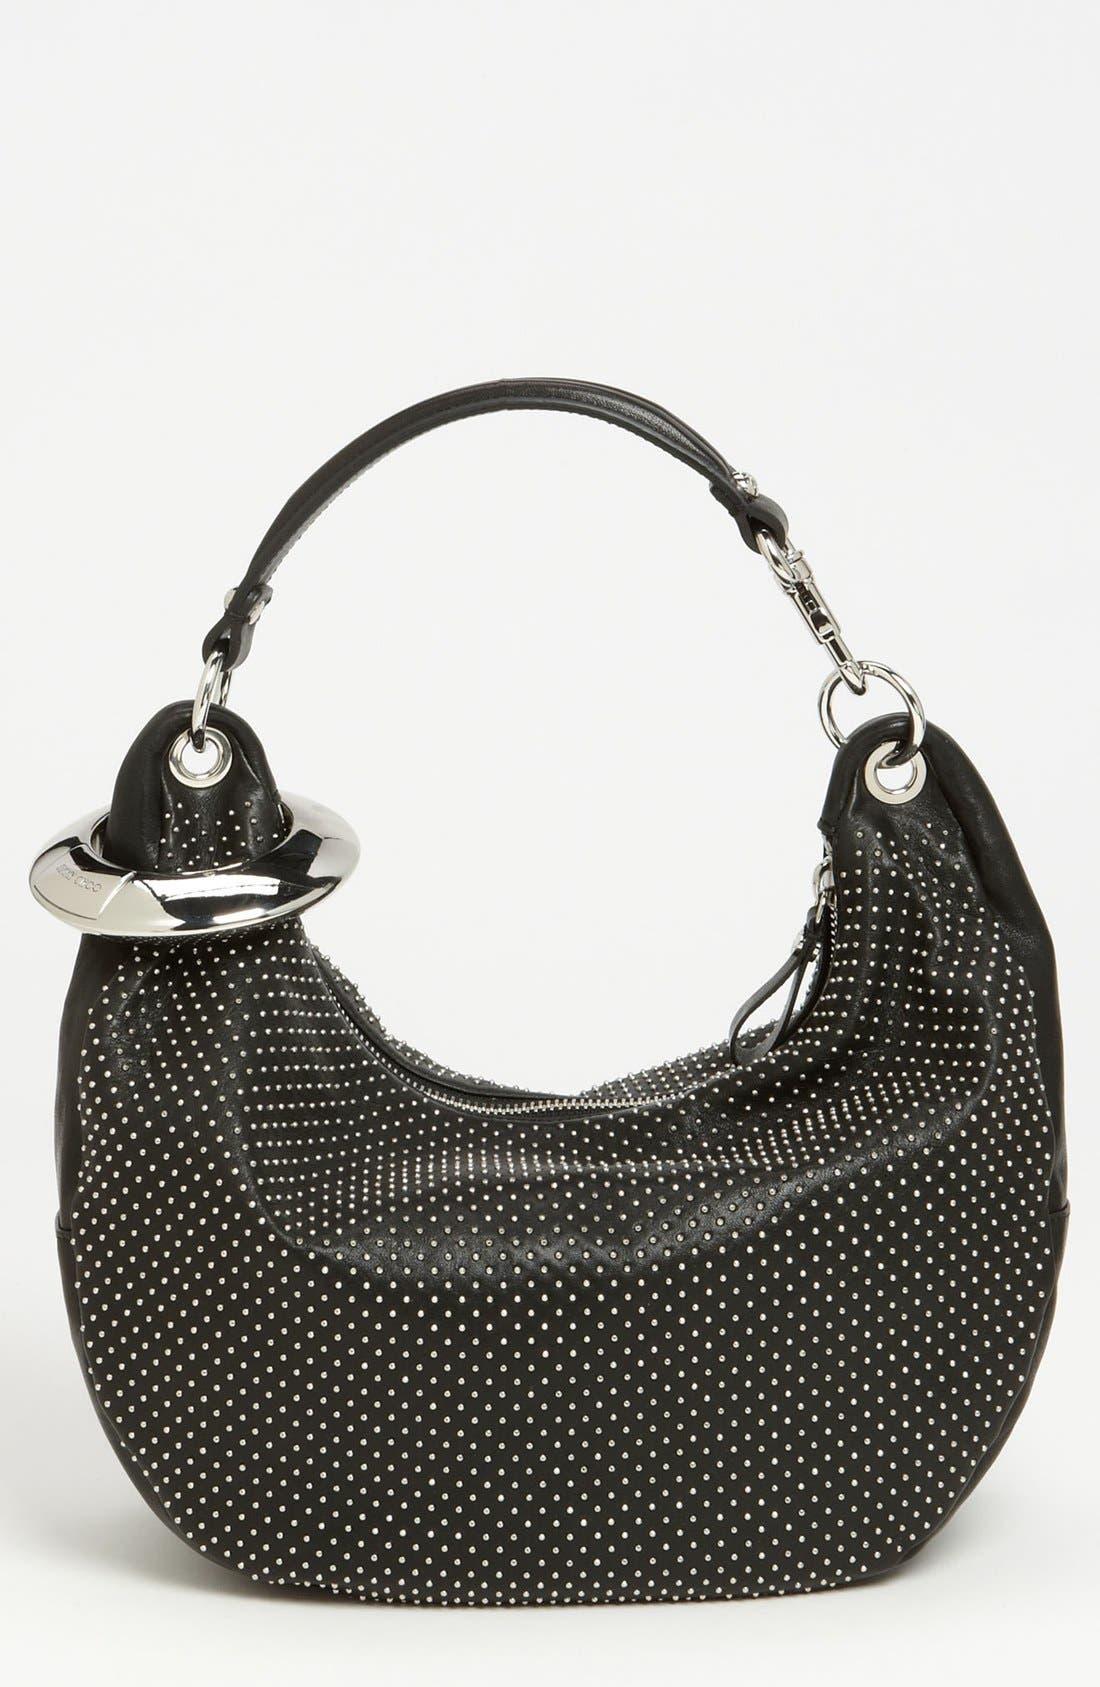 Main Image - Jimmy Choo 'Solar - Small' Studded Leather Hobo